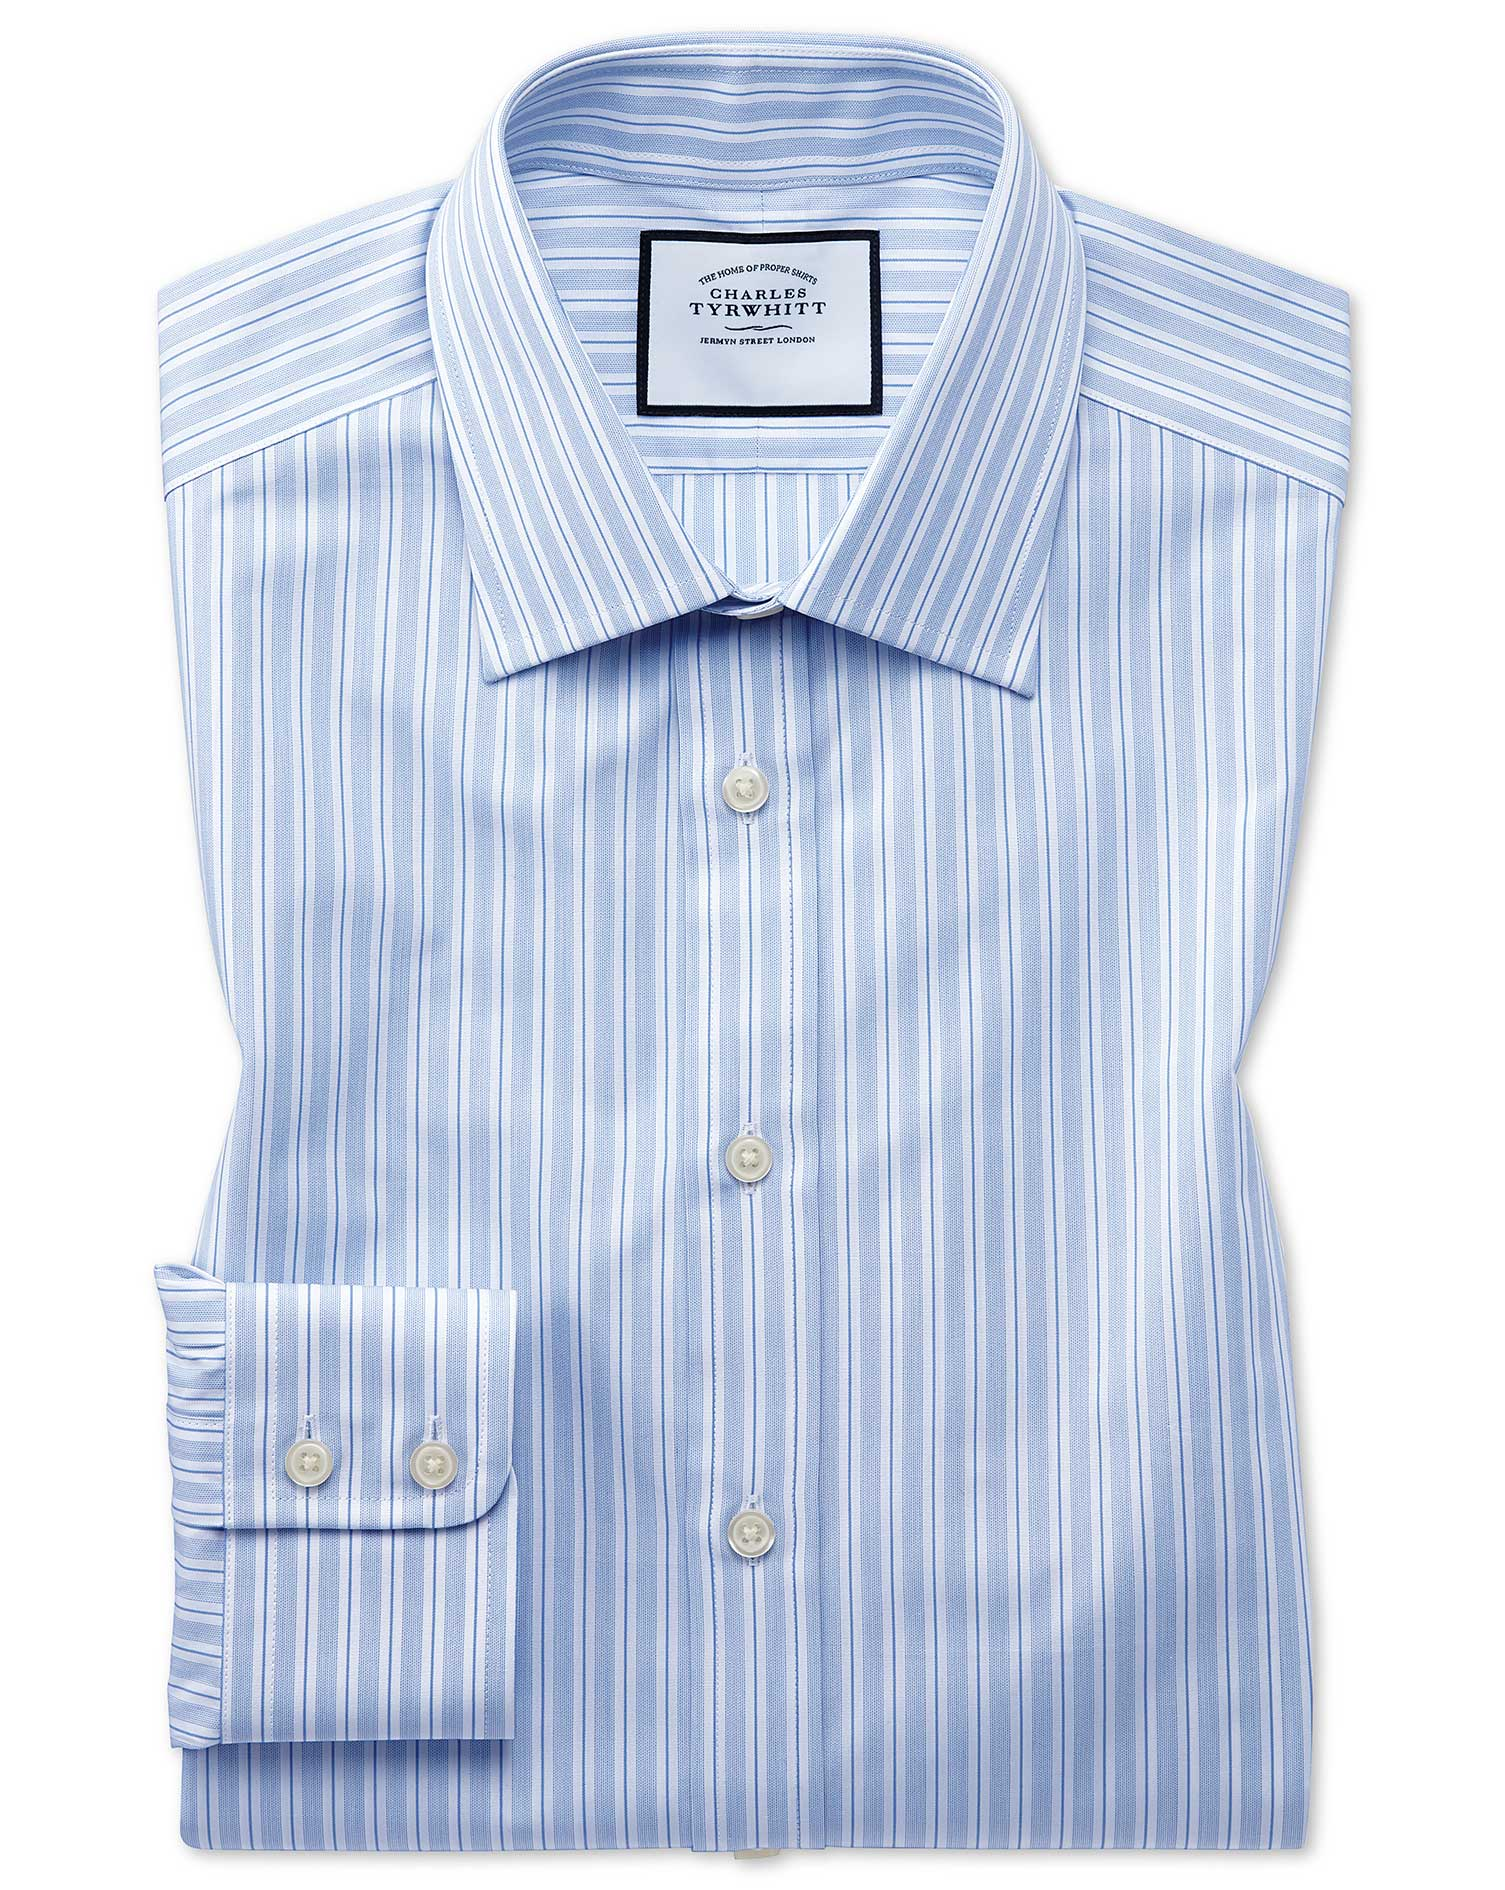 Slim Fit Egyptian Cotton Poplin Sky Blue Stripe Formal Shirt Single Cuff Size 16/35 by Charles Tyrwh